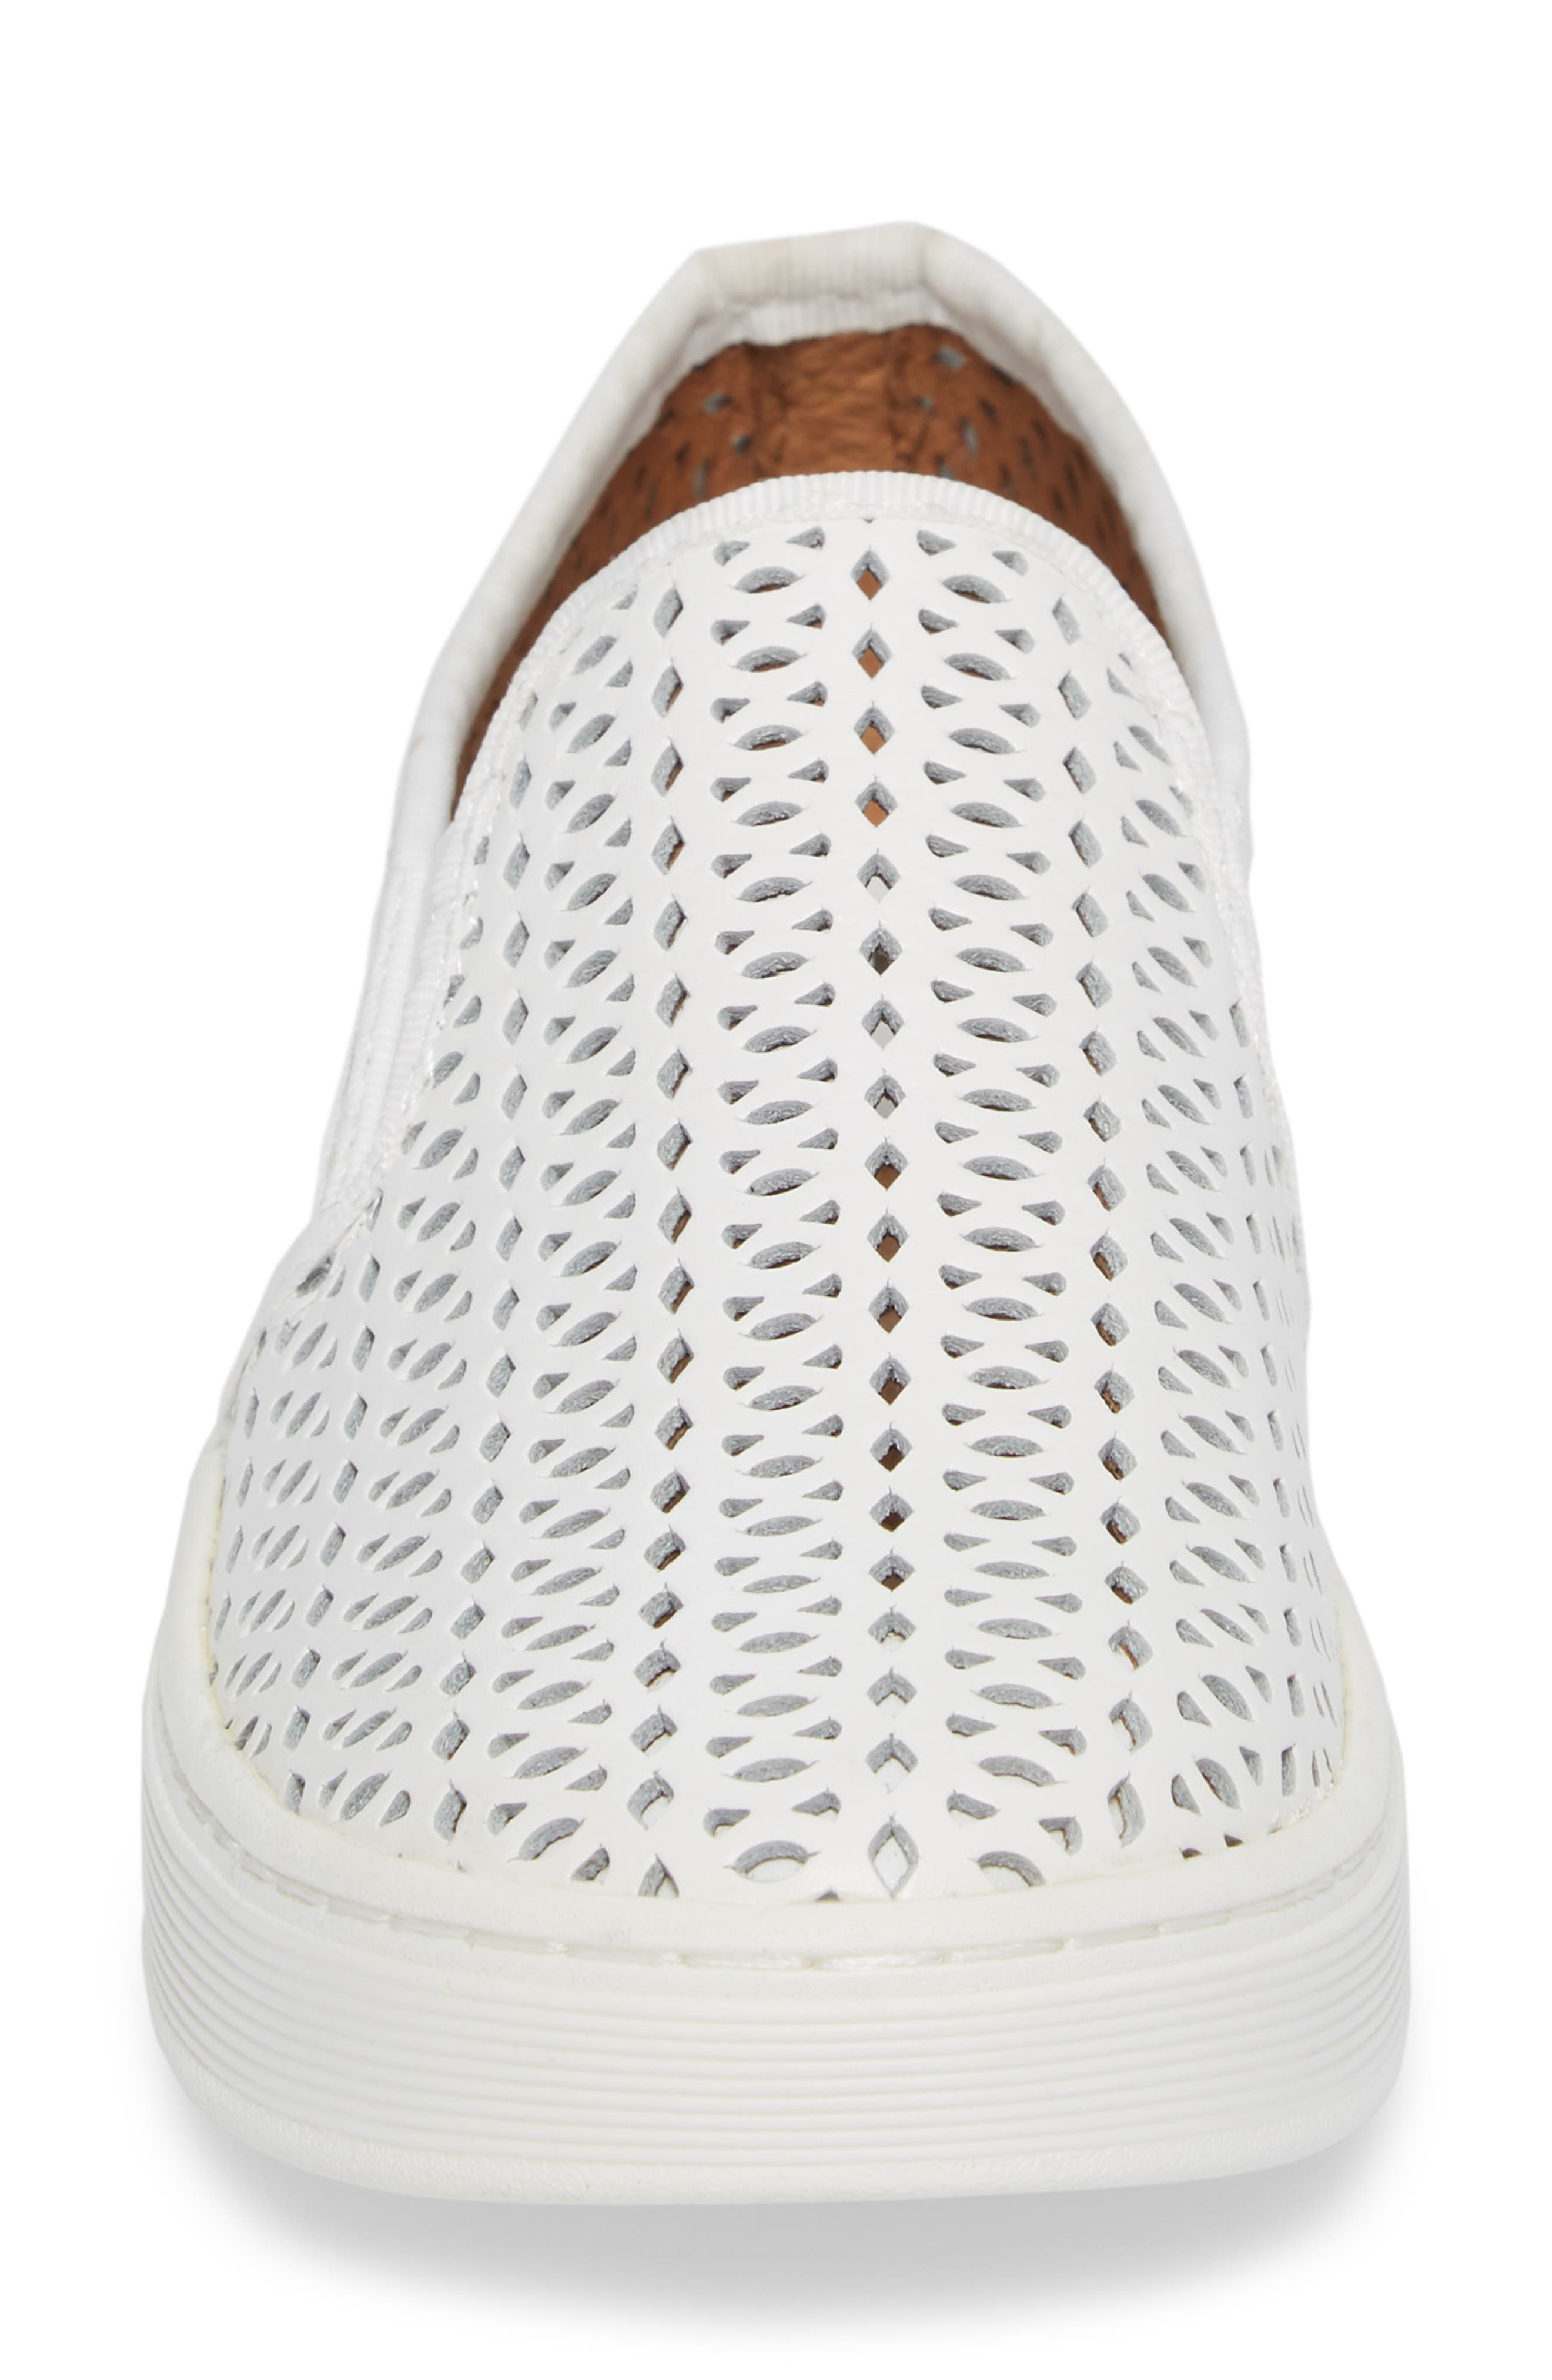 Somers II Slip-On Sneaker,                             Alternate thumbnail 4, color,                             WHITE LEATHER